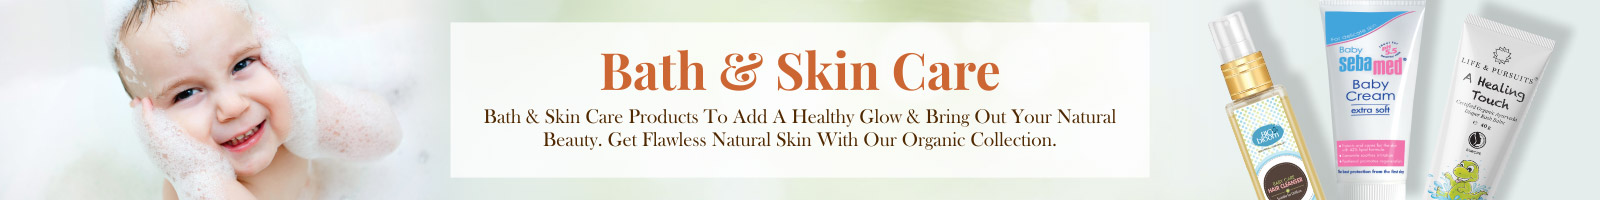 Bath and Skin Care